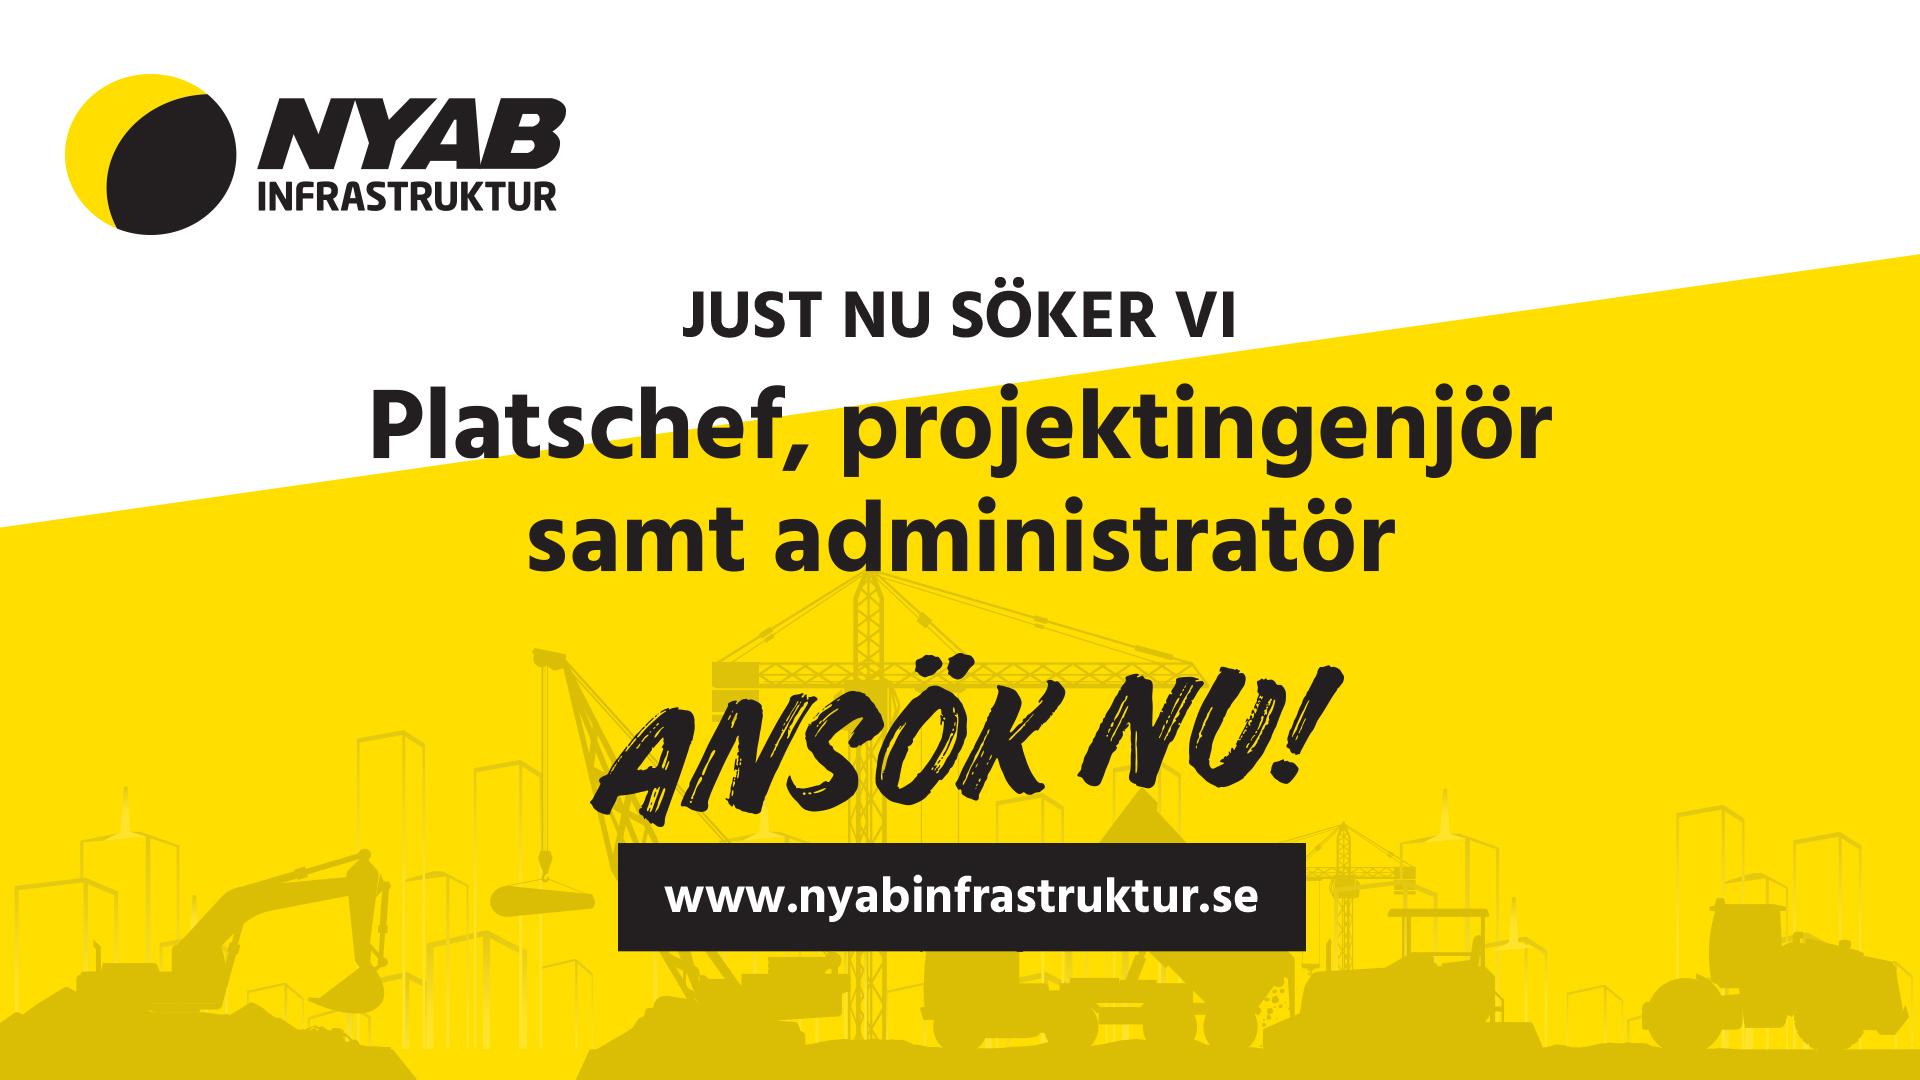 NYAB2.jpg